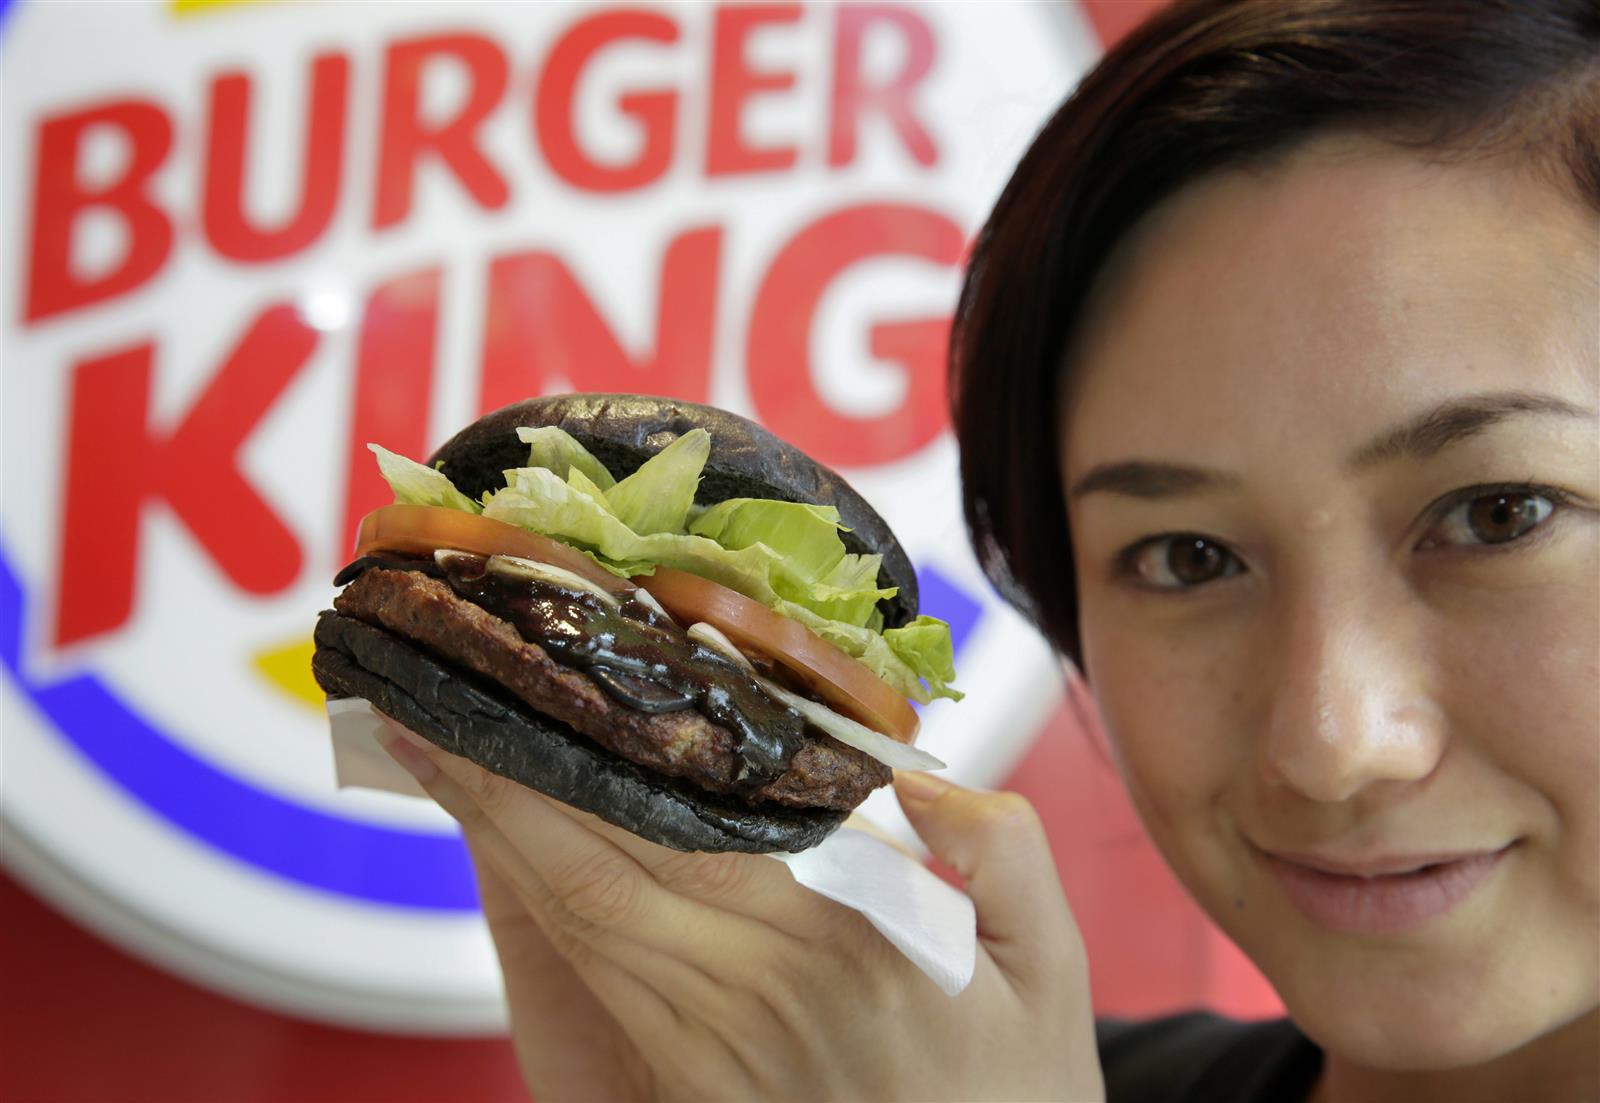 Burger King KURO Diamond Burger